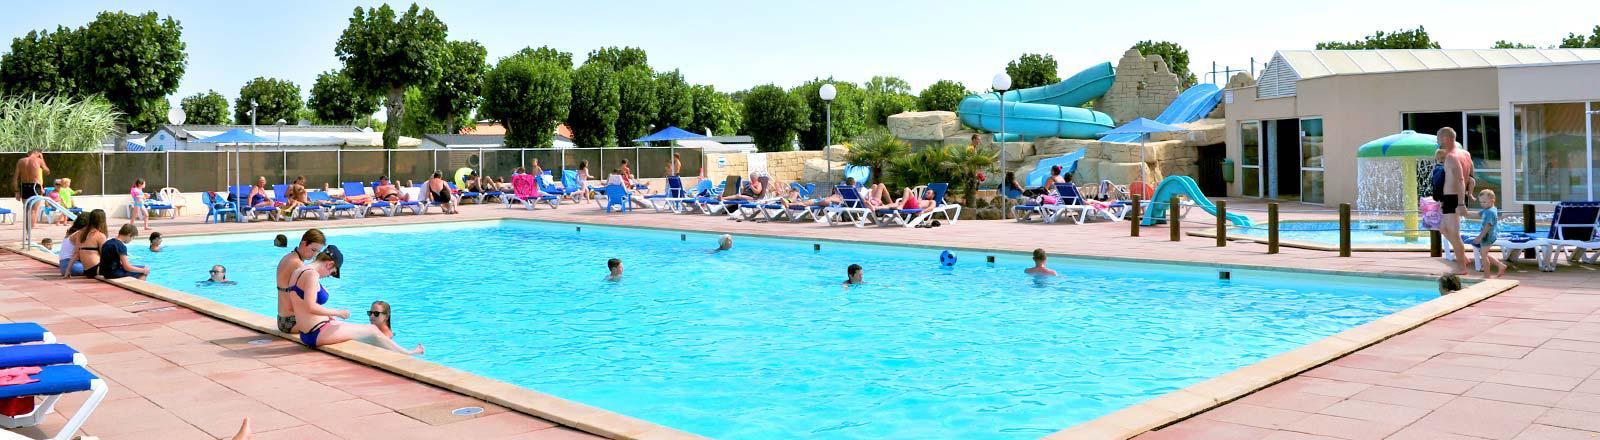 camping-vendee-avec-piscine-chauffee-bonnes-vacances-sarl